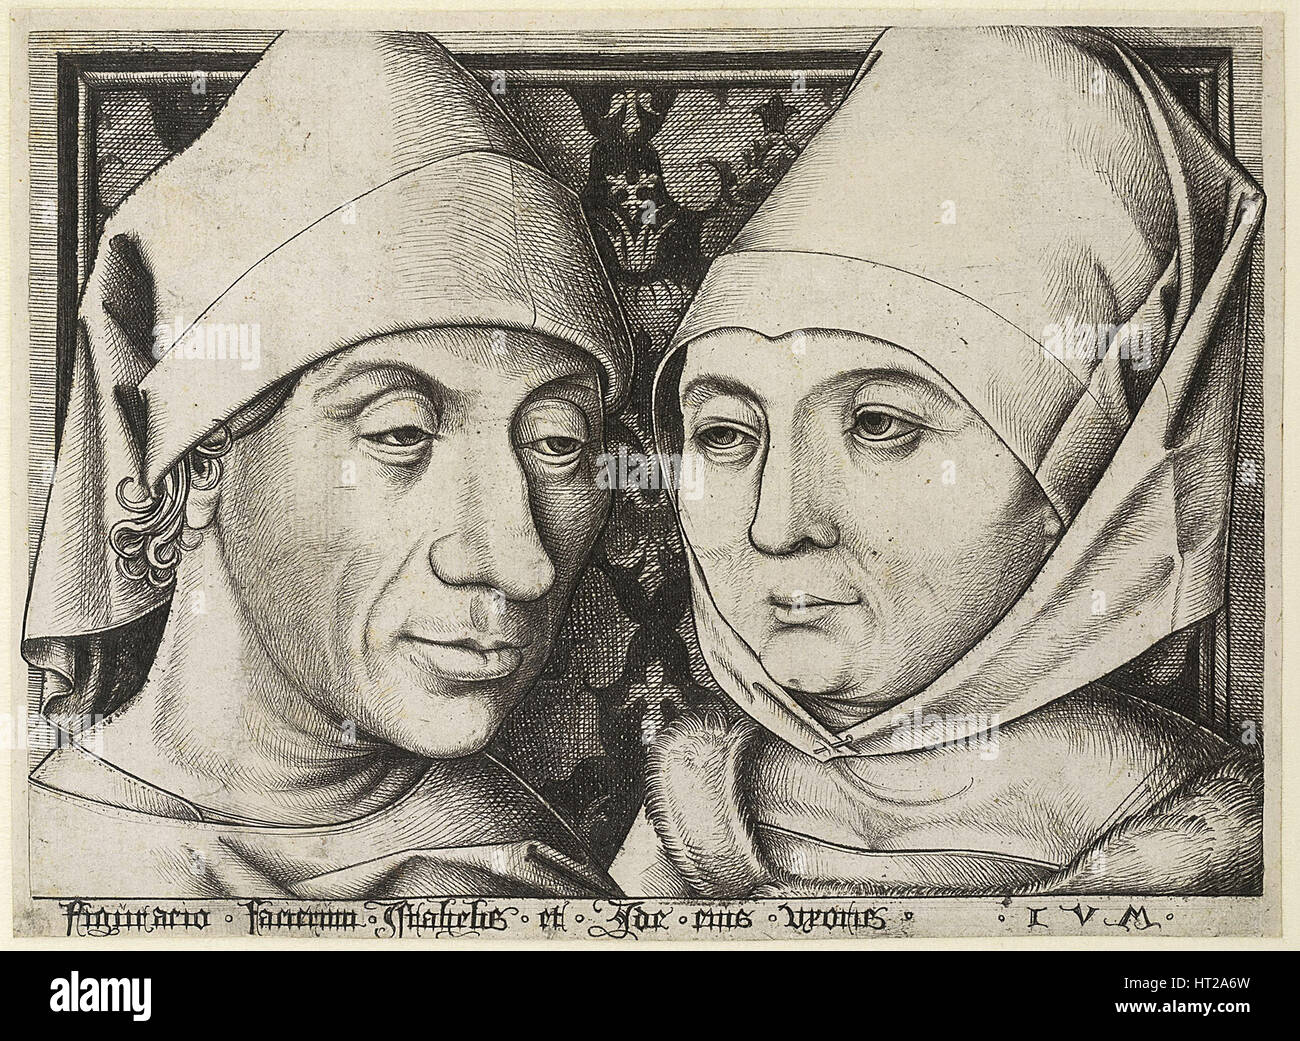 Self-Portrait with wife Ida, c. 1490. Artist: Meckenem, Israhel van, the Younger (ca 1440-1503) - Stock Image